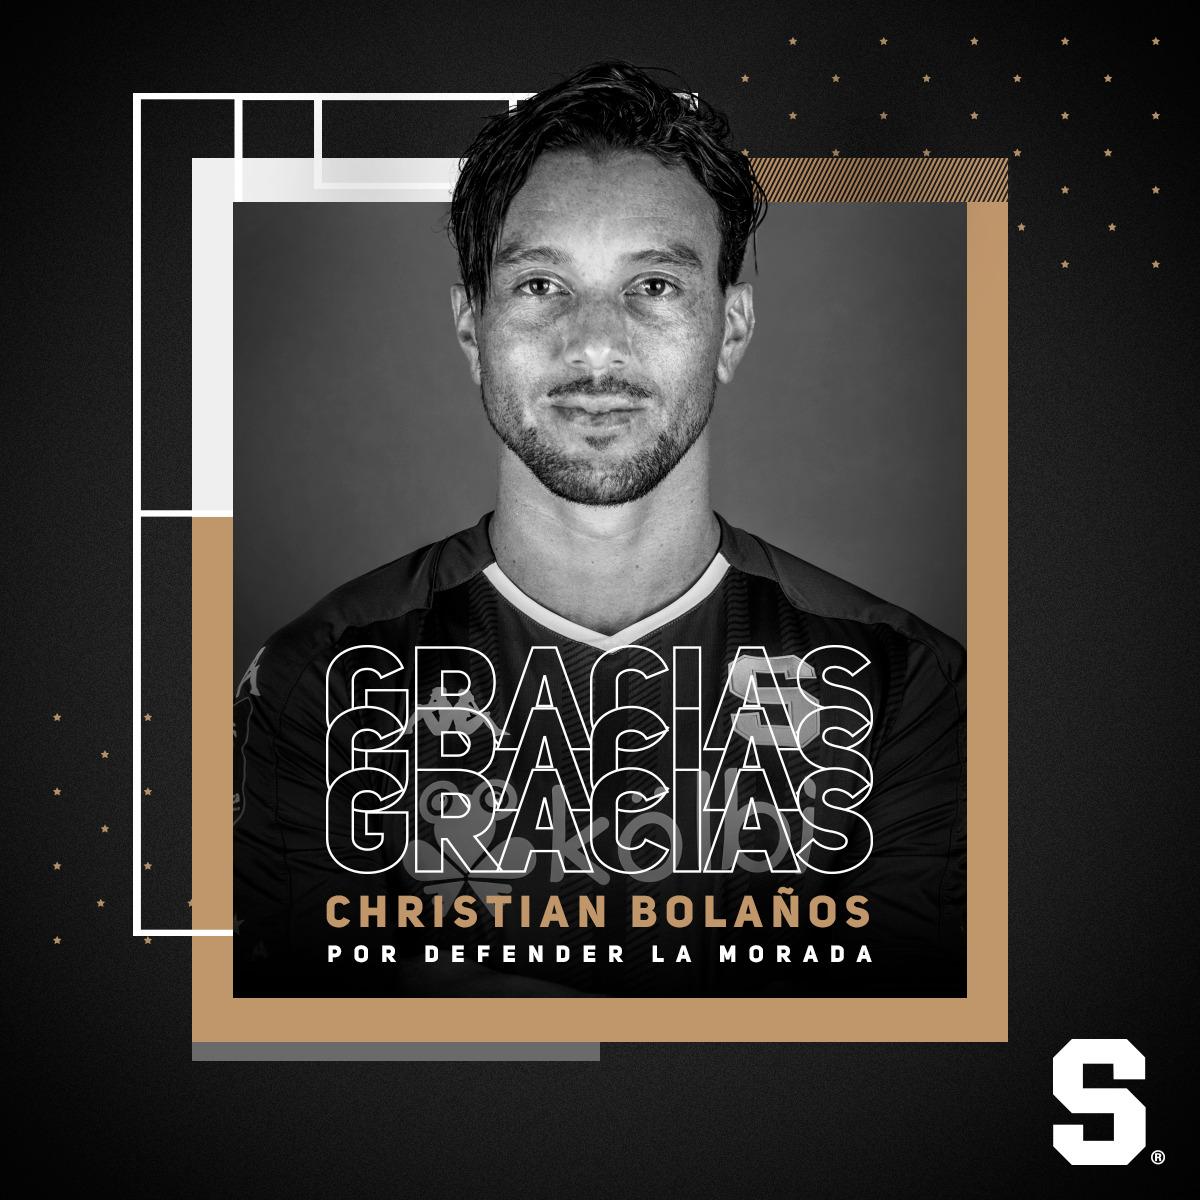 Christian Bolaños deja el Saprissa y se vincula al IK Start de Noruega.